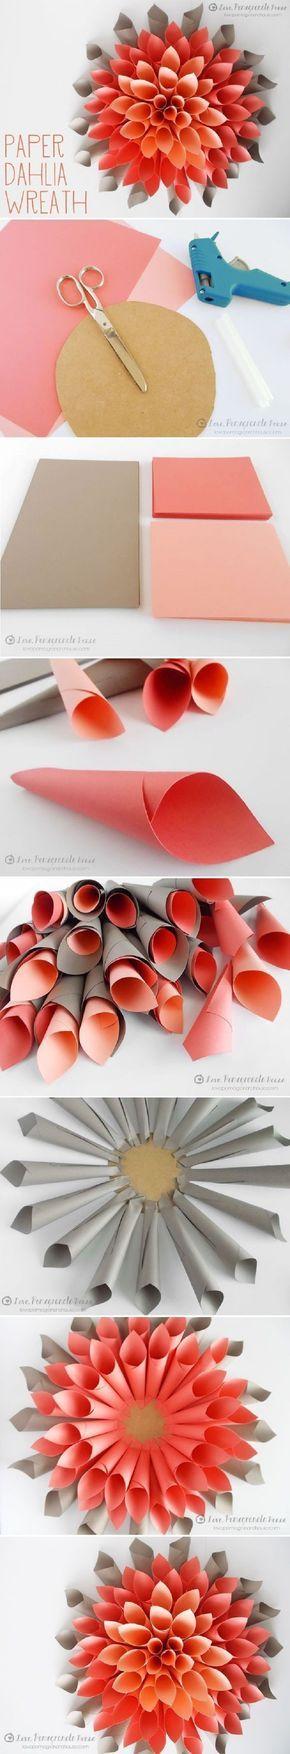 DIY Paper Dahlia Wreath - 15 Most PINteresting DIY Paper Decorations   GleamItUp